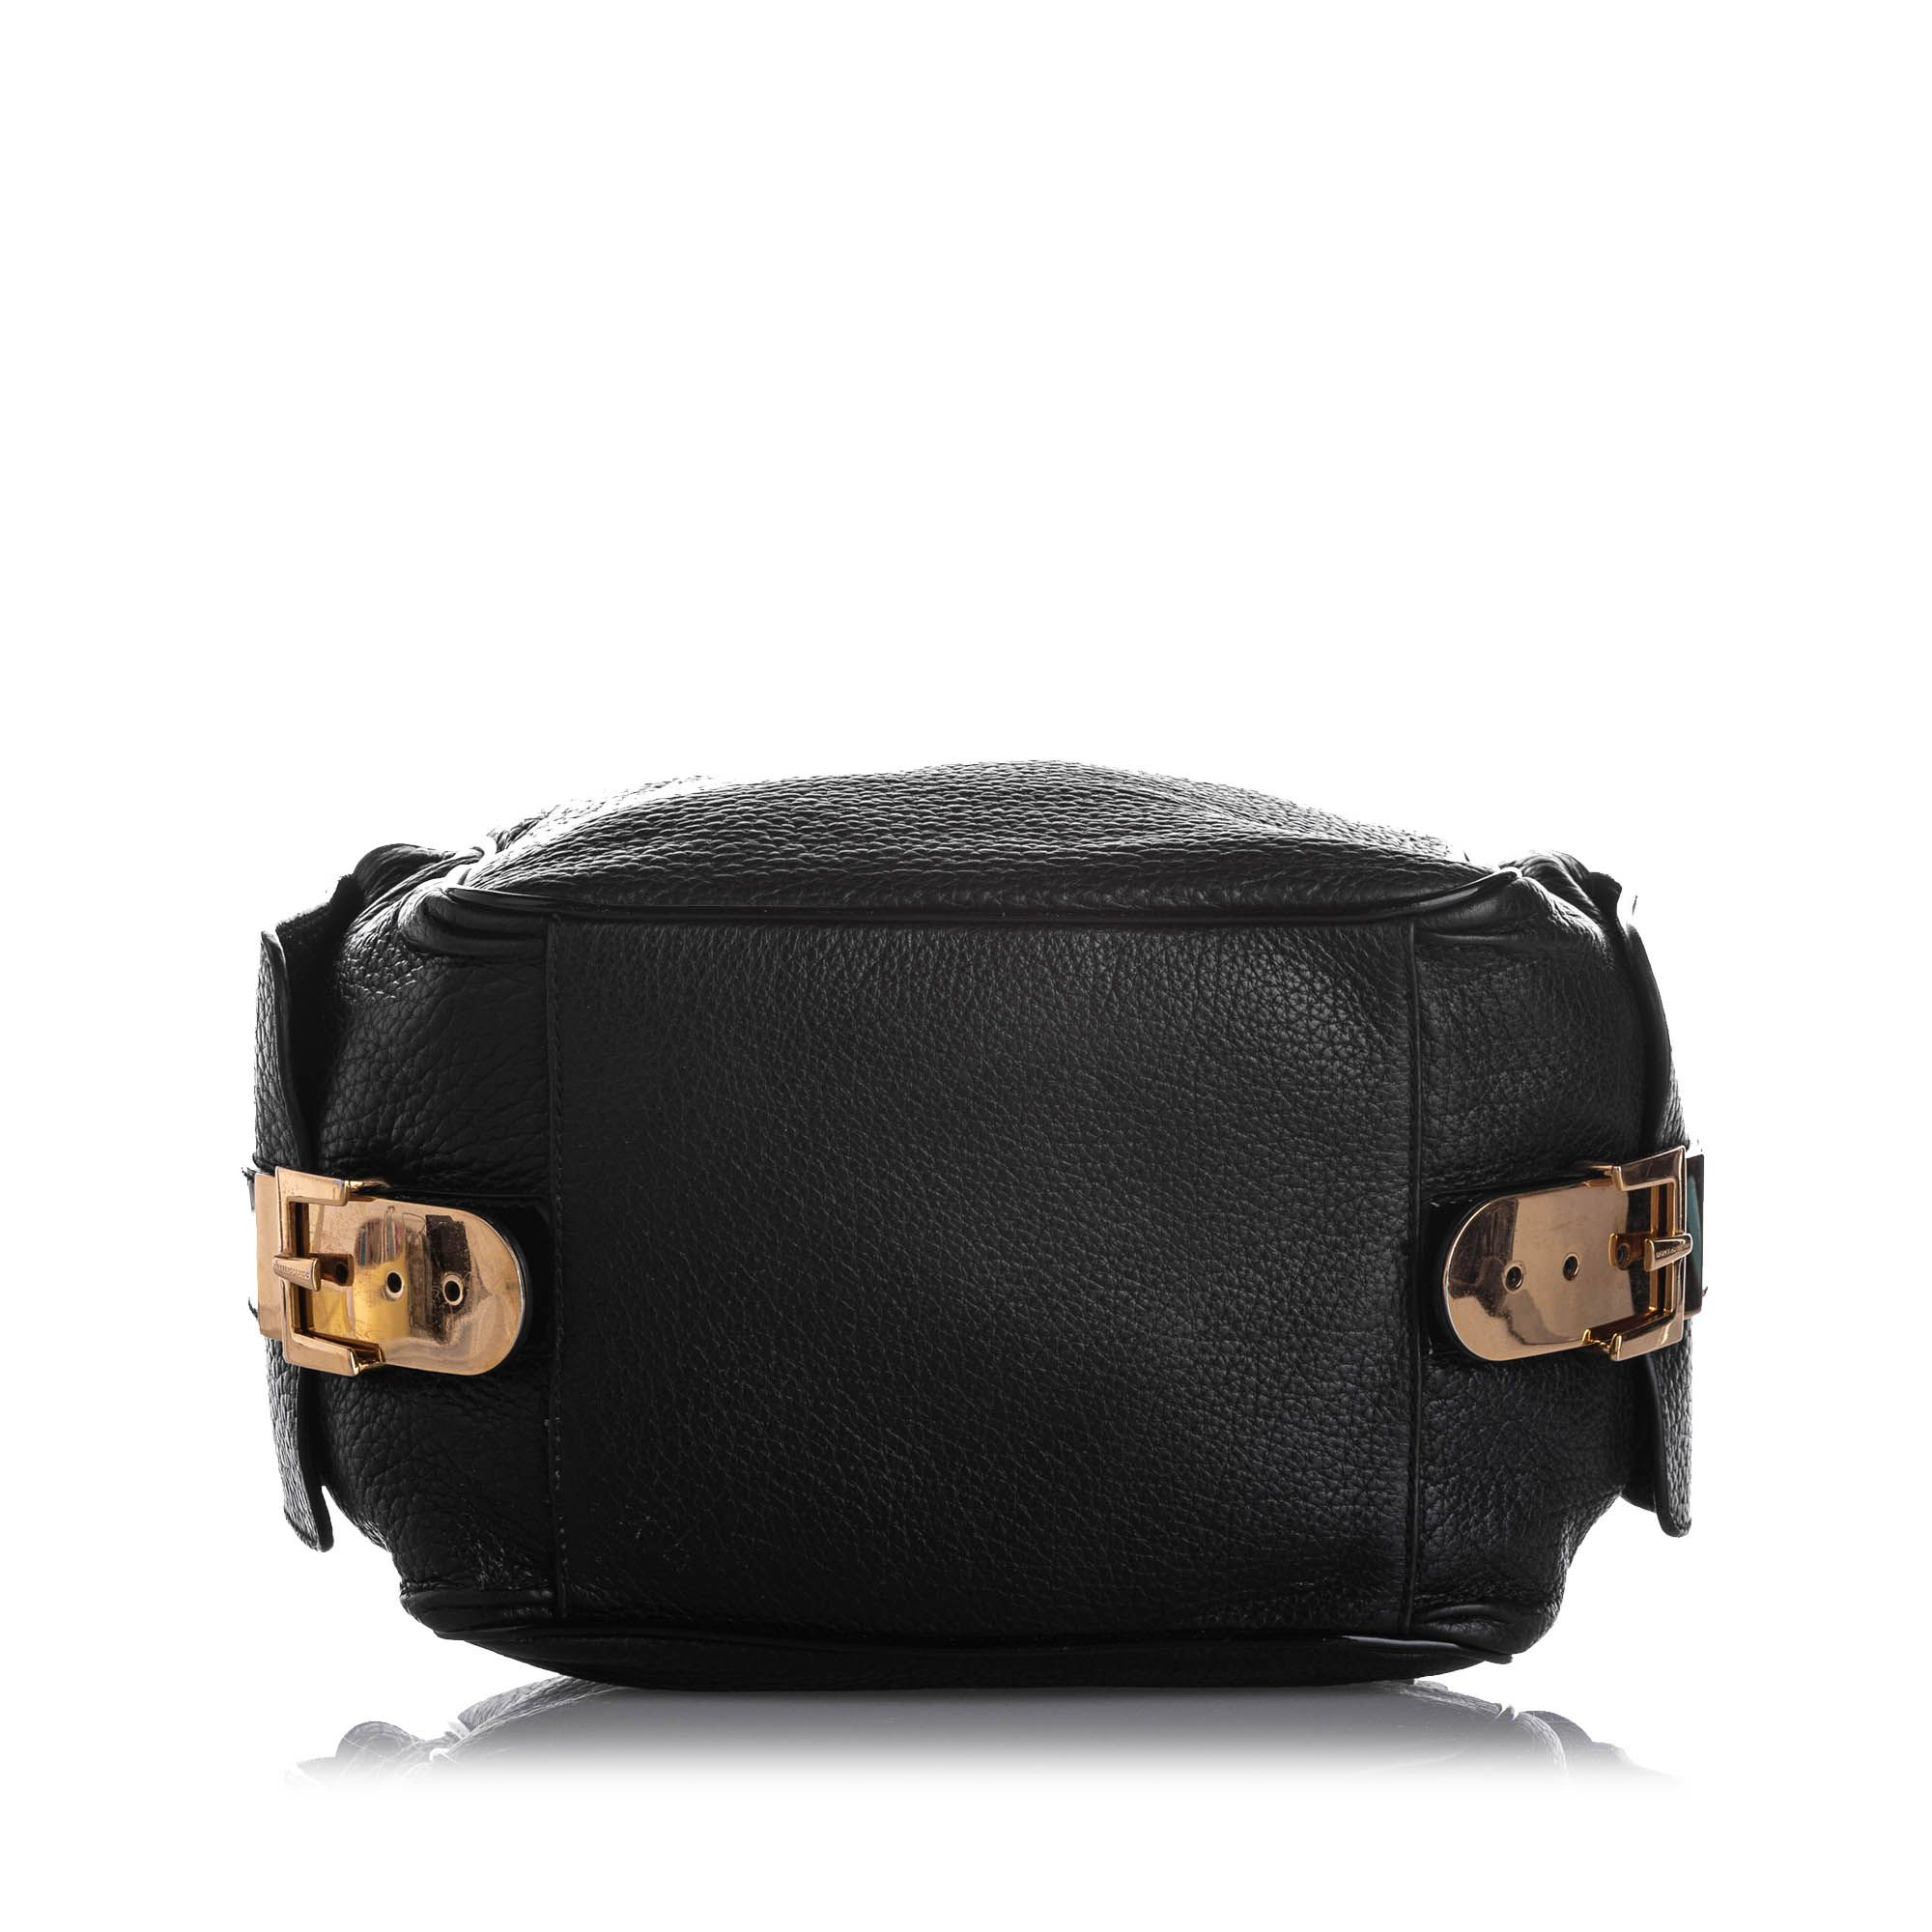 Vintage Dolce&Gabbana Leather Crossbody Bag Black